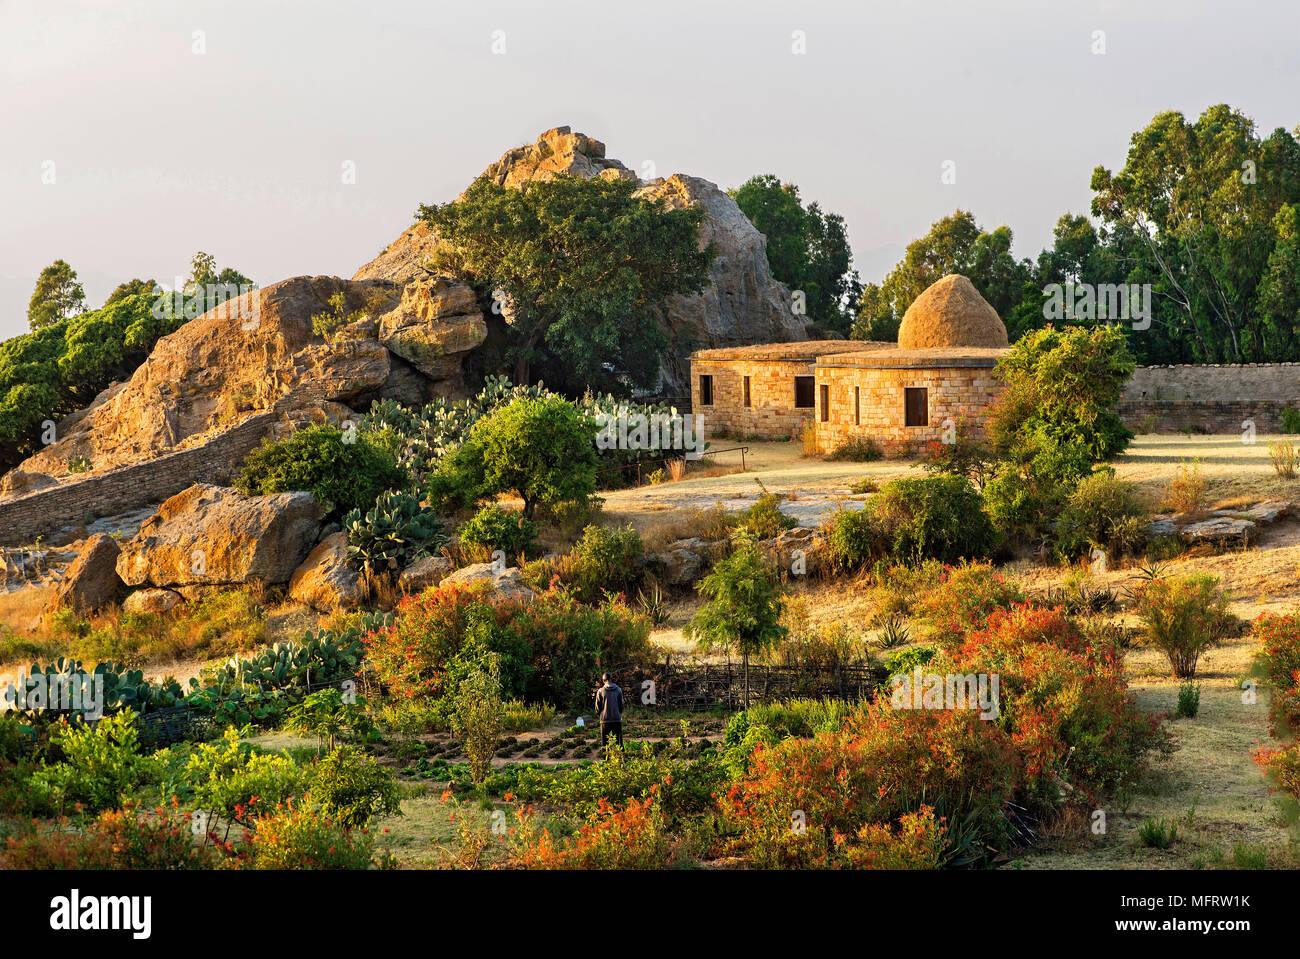 Guest accommodation, Gheralta-Lodge, Hawzien, Tigray, Etiopía Imagen De Stock